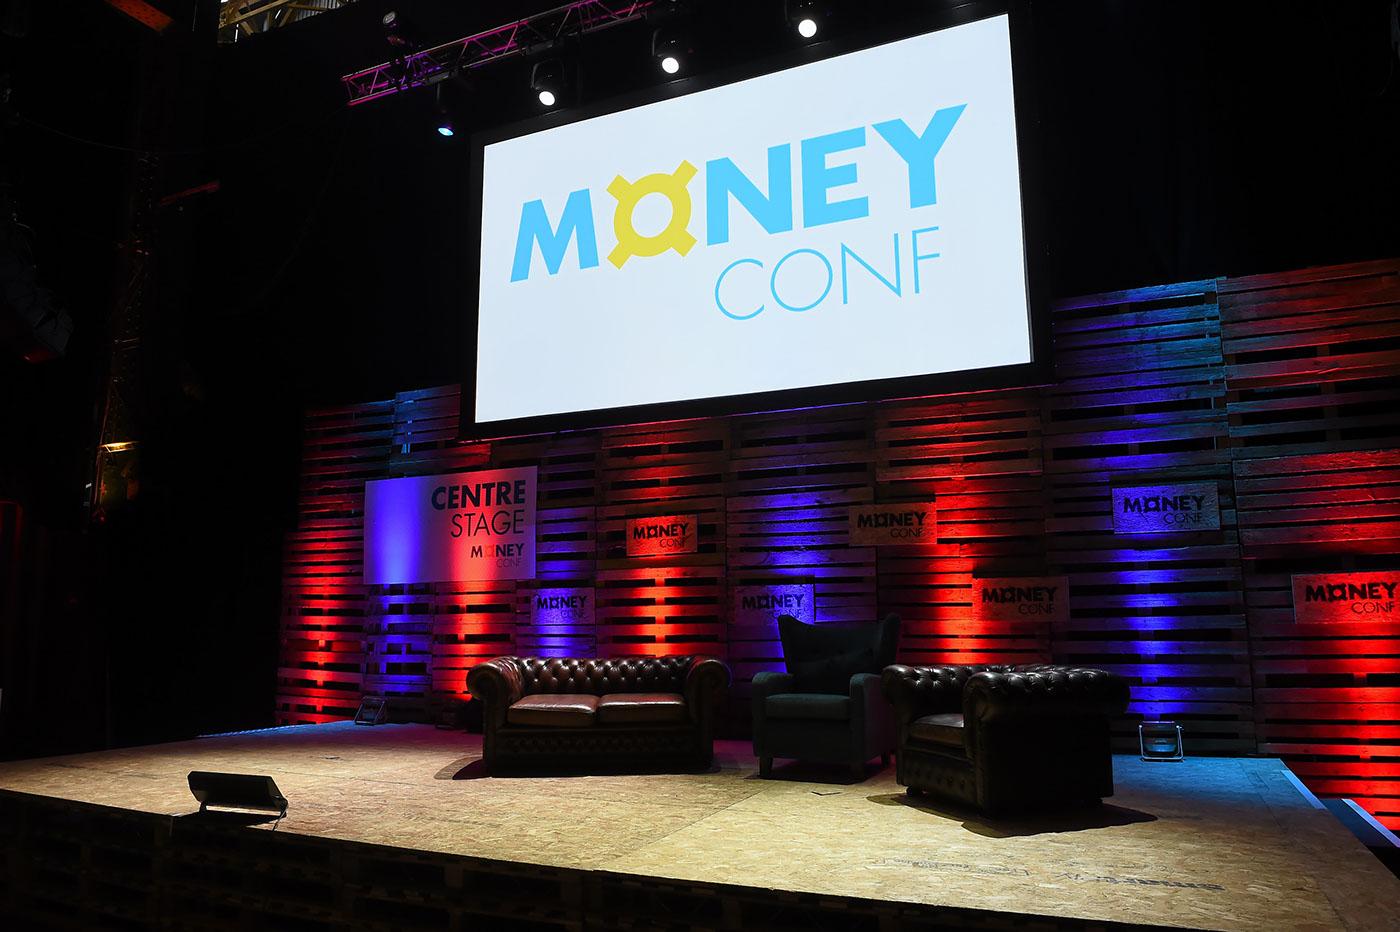 moneyconf Belfast websummit Collision Fintech money guilloche conference Ireland financial Bank awesome modern tech Startup